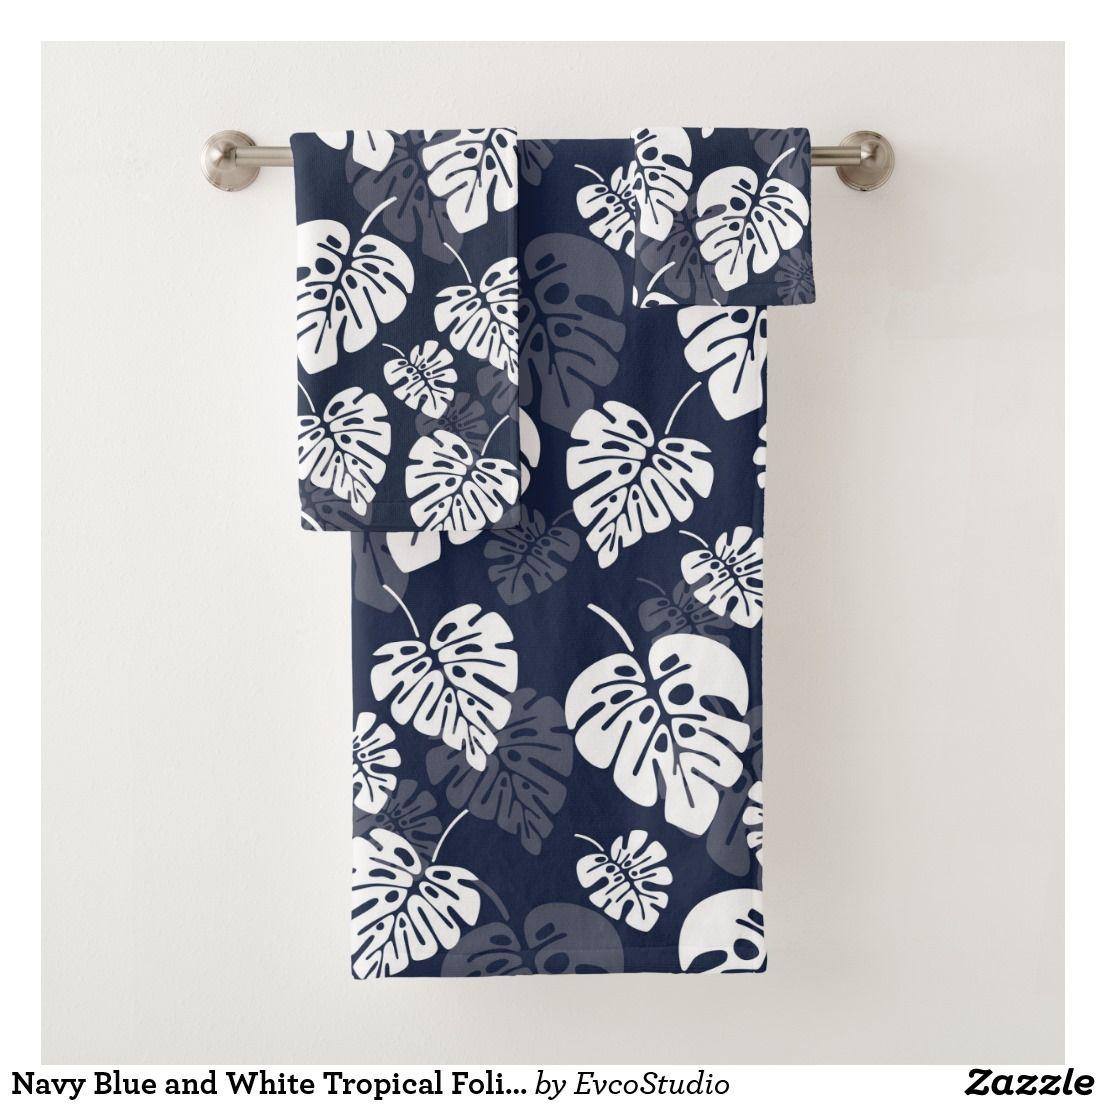 Navy Blue And White Tropical Foliage Floral Bath Towel Set